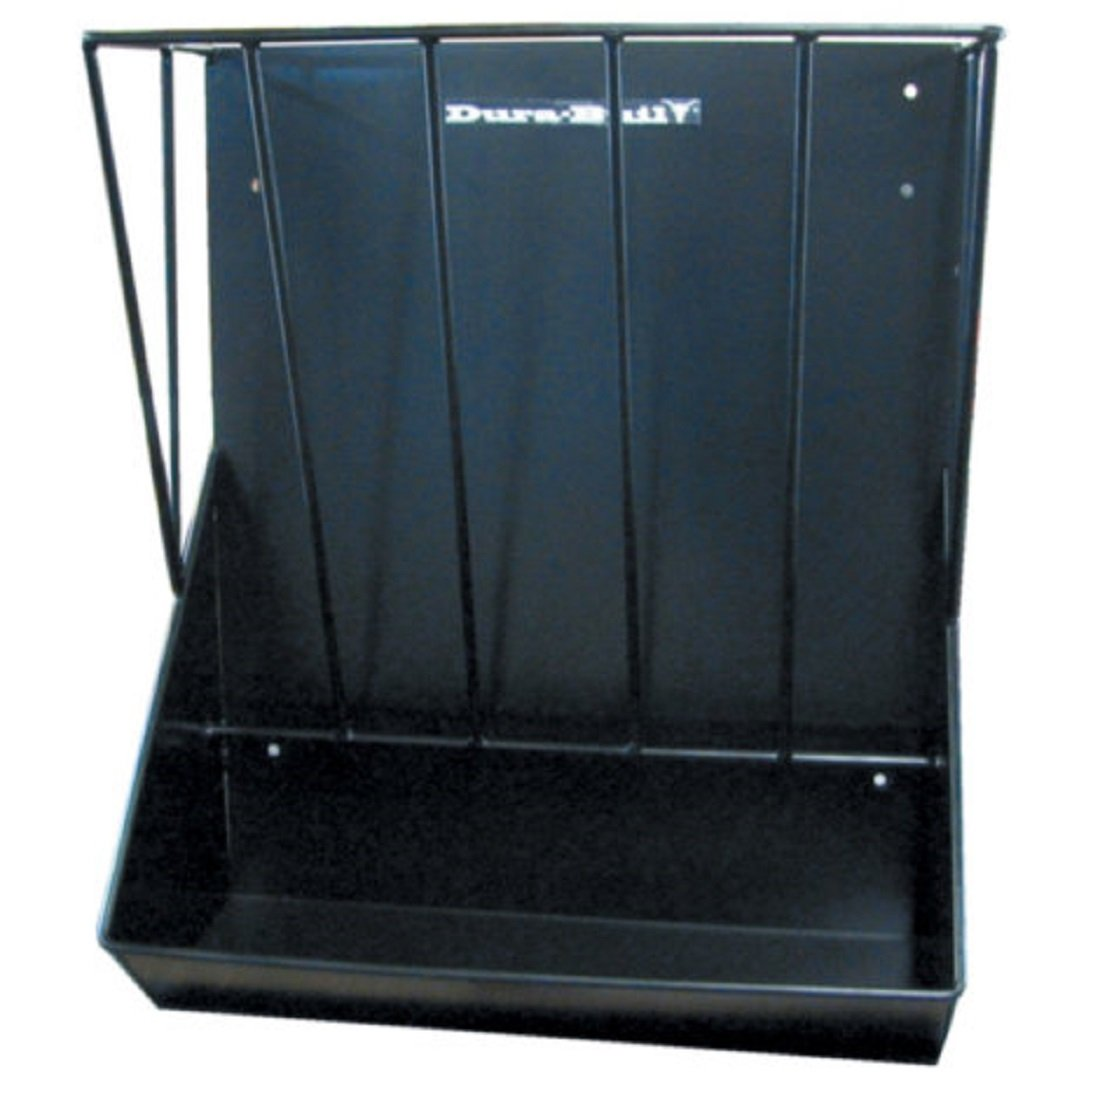 DURABUILT Combination 2-1 Hay and Grain Feeder - 16-gauge steel, fence or wall mount - 2' W x 1' D x 2.5' H